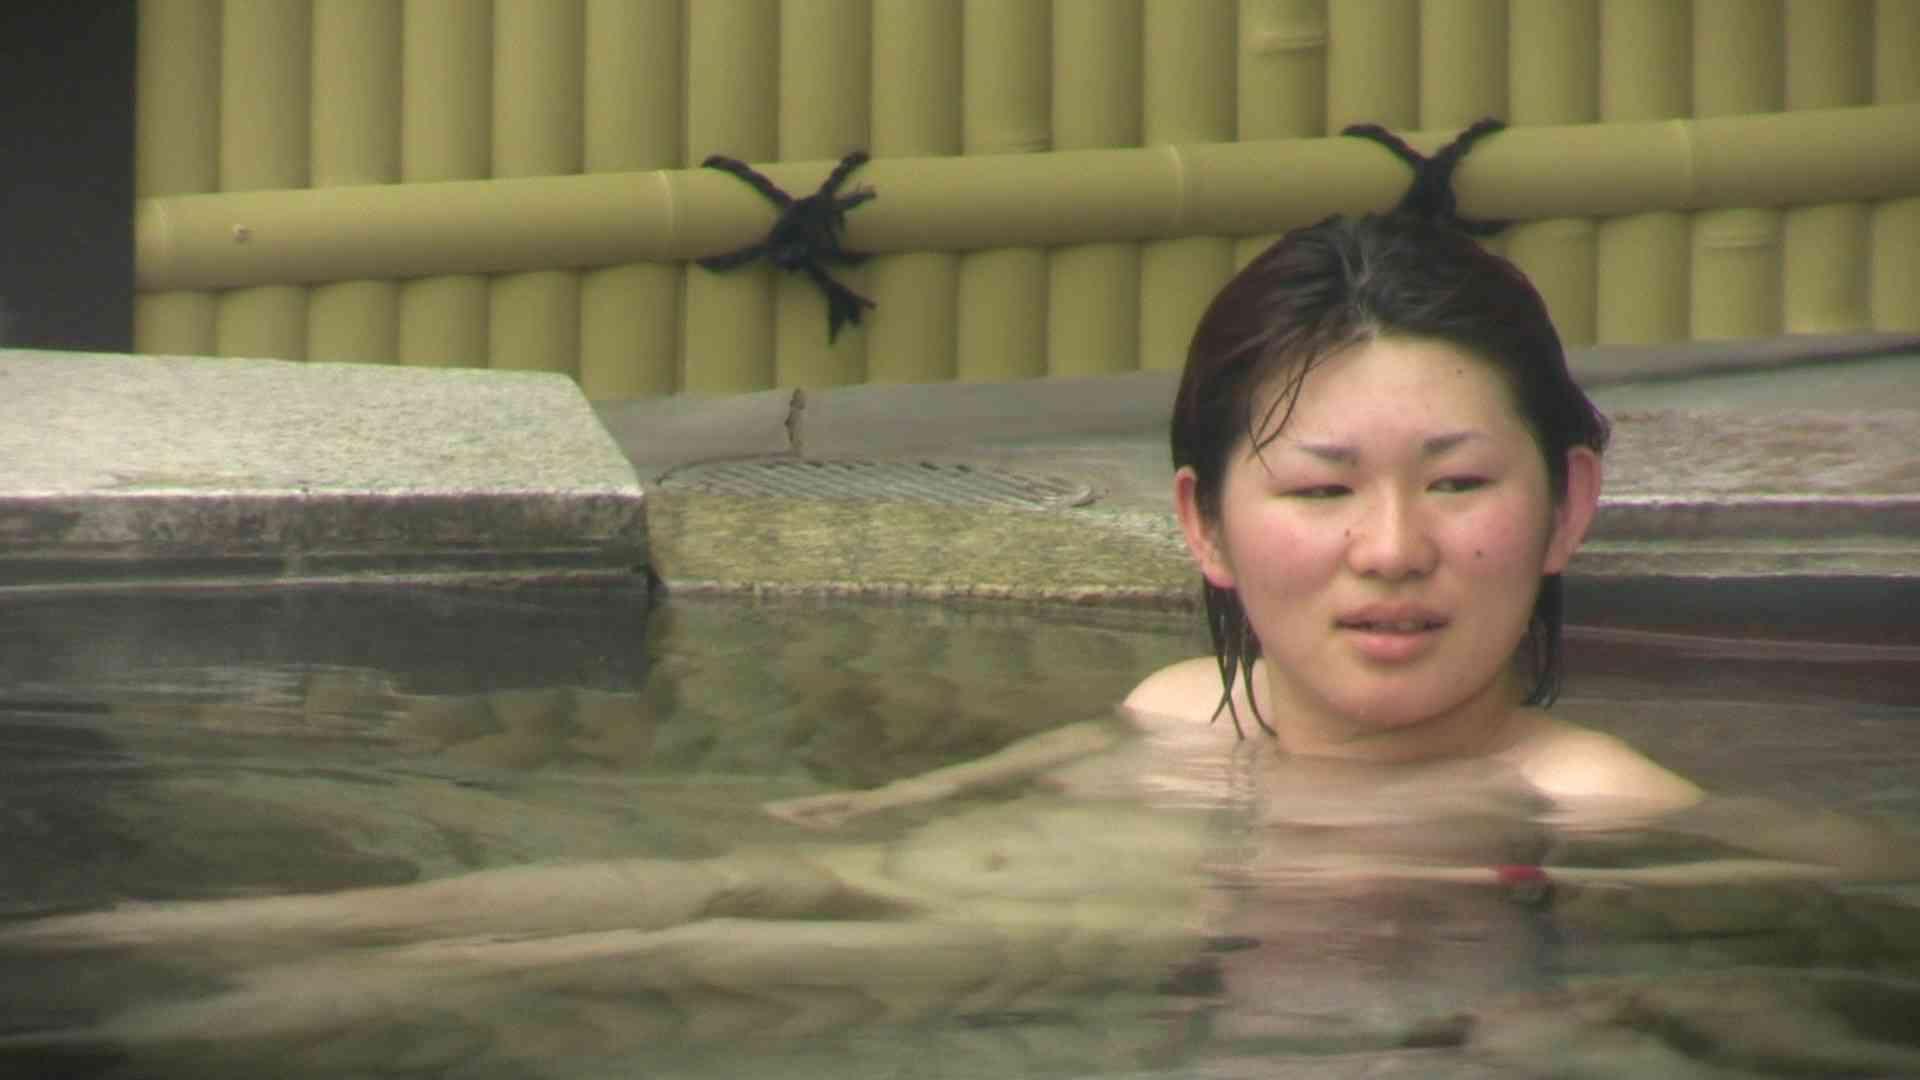 Aquaな露天風呂Vol.673 露天風呂突入 盗み撮り動画キャプチャ 99pic 80